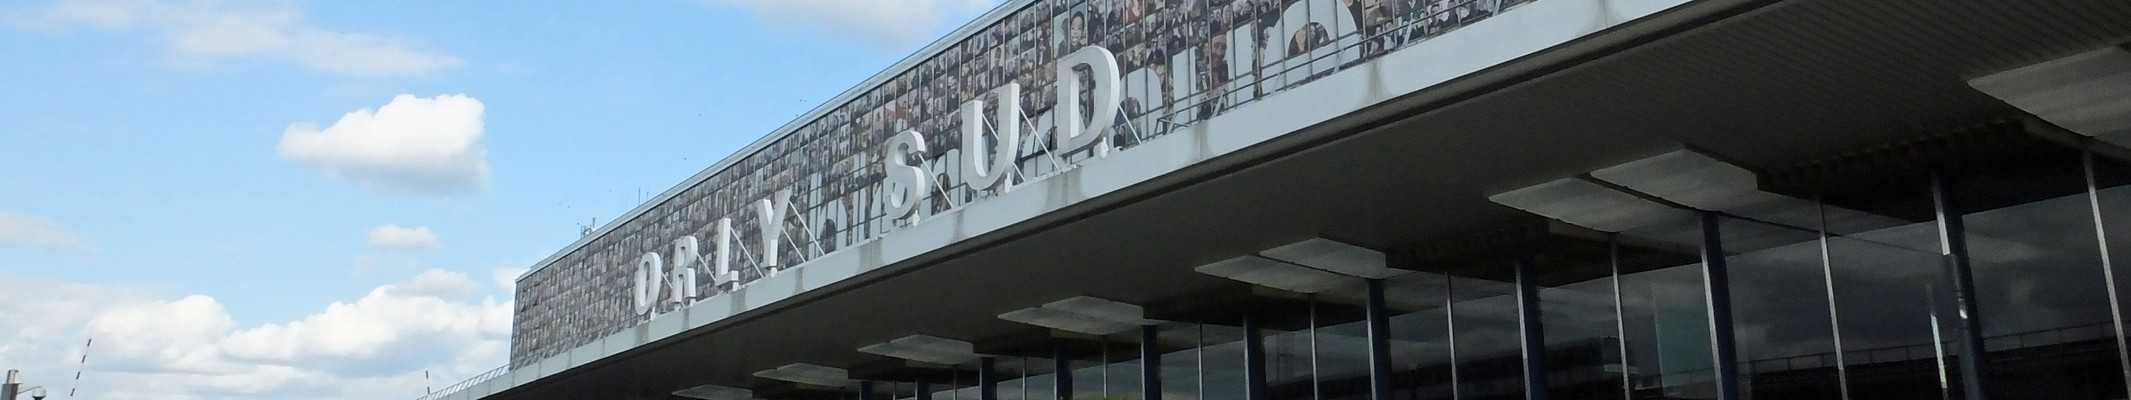 Panorama de l'aéroport d'Orly au Terminal Sud